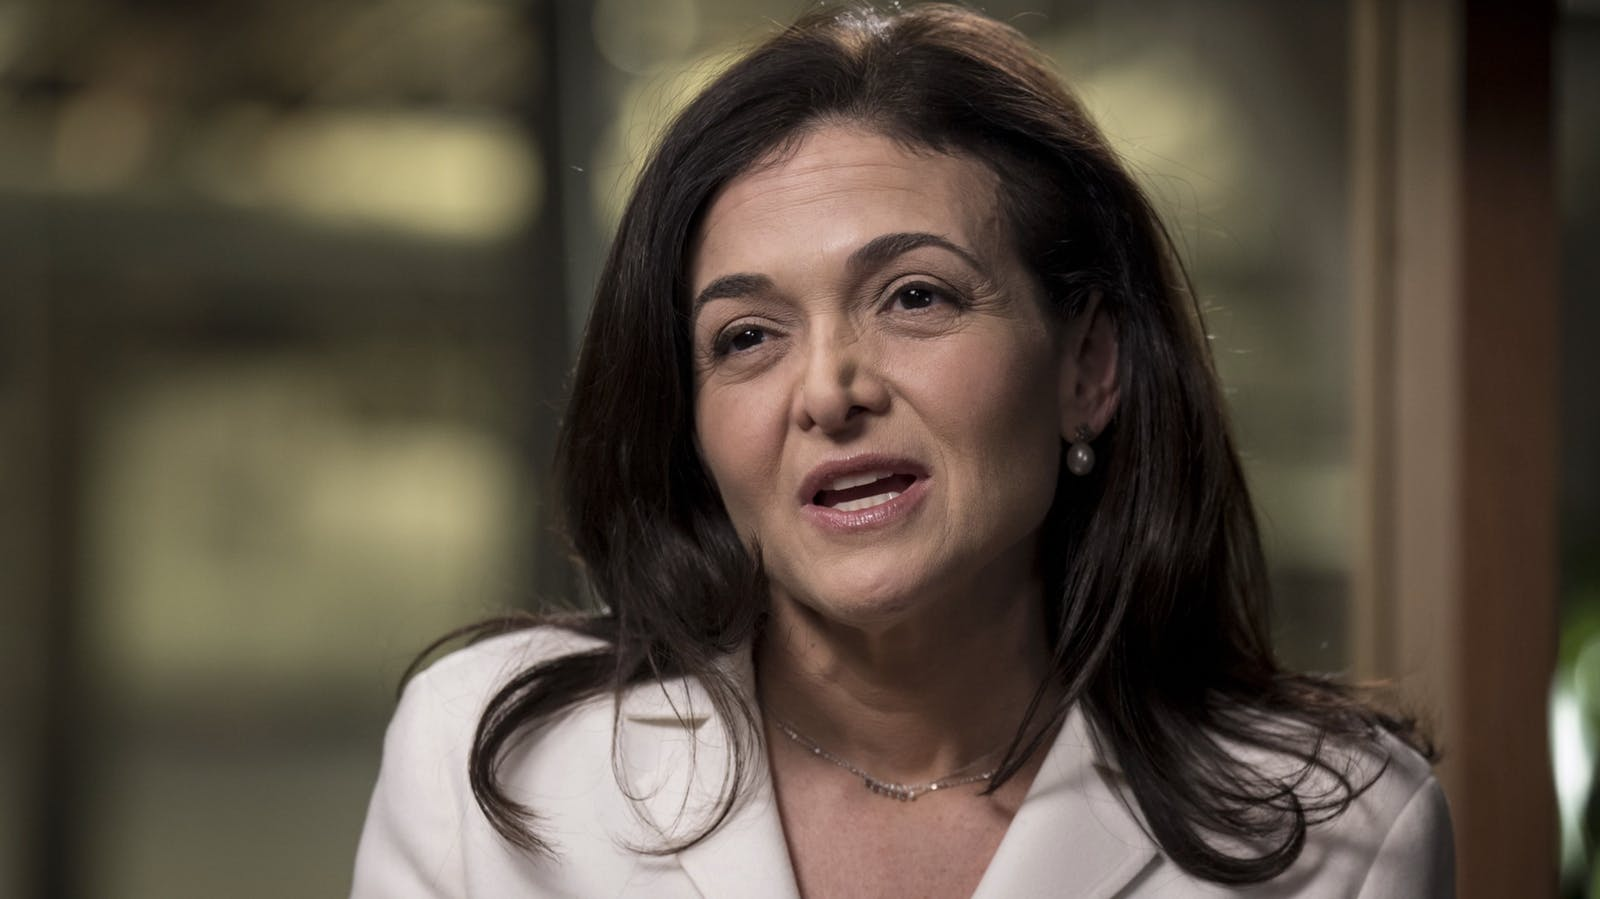 Facebook COO Sheryl Sandberg. Photo by Bloomberg.